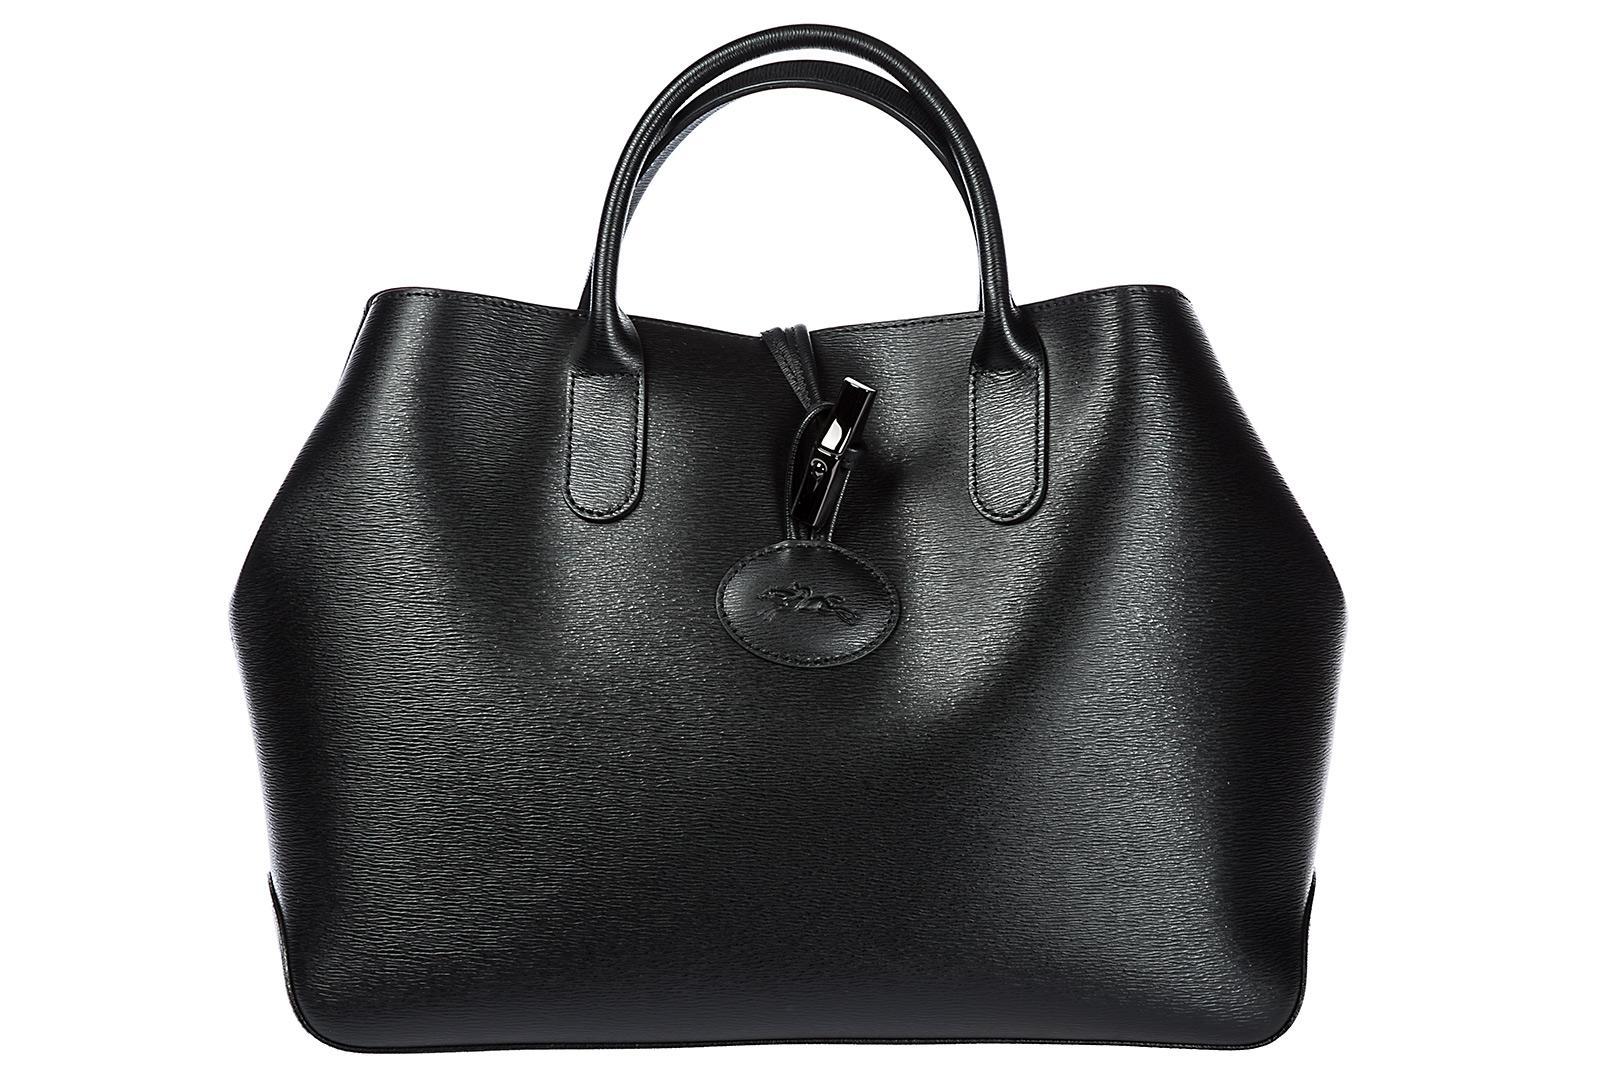 Longchamp Women's Leather Handbag Shopping Bag Purse In Black